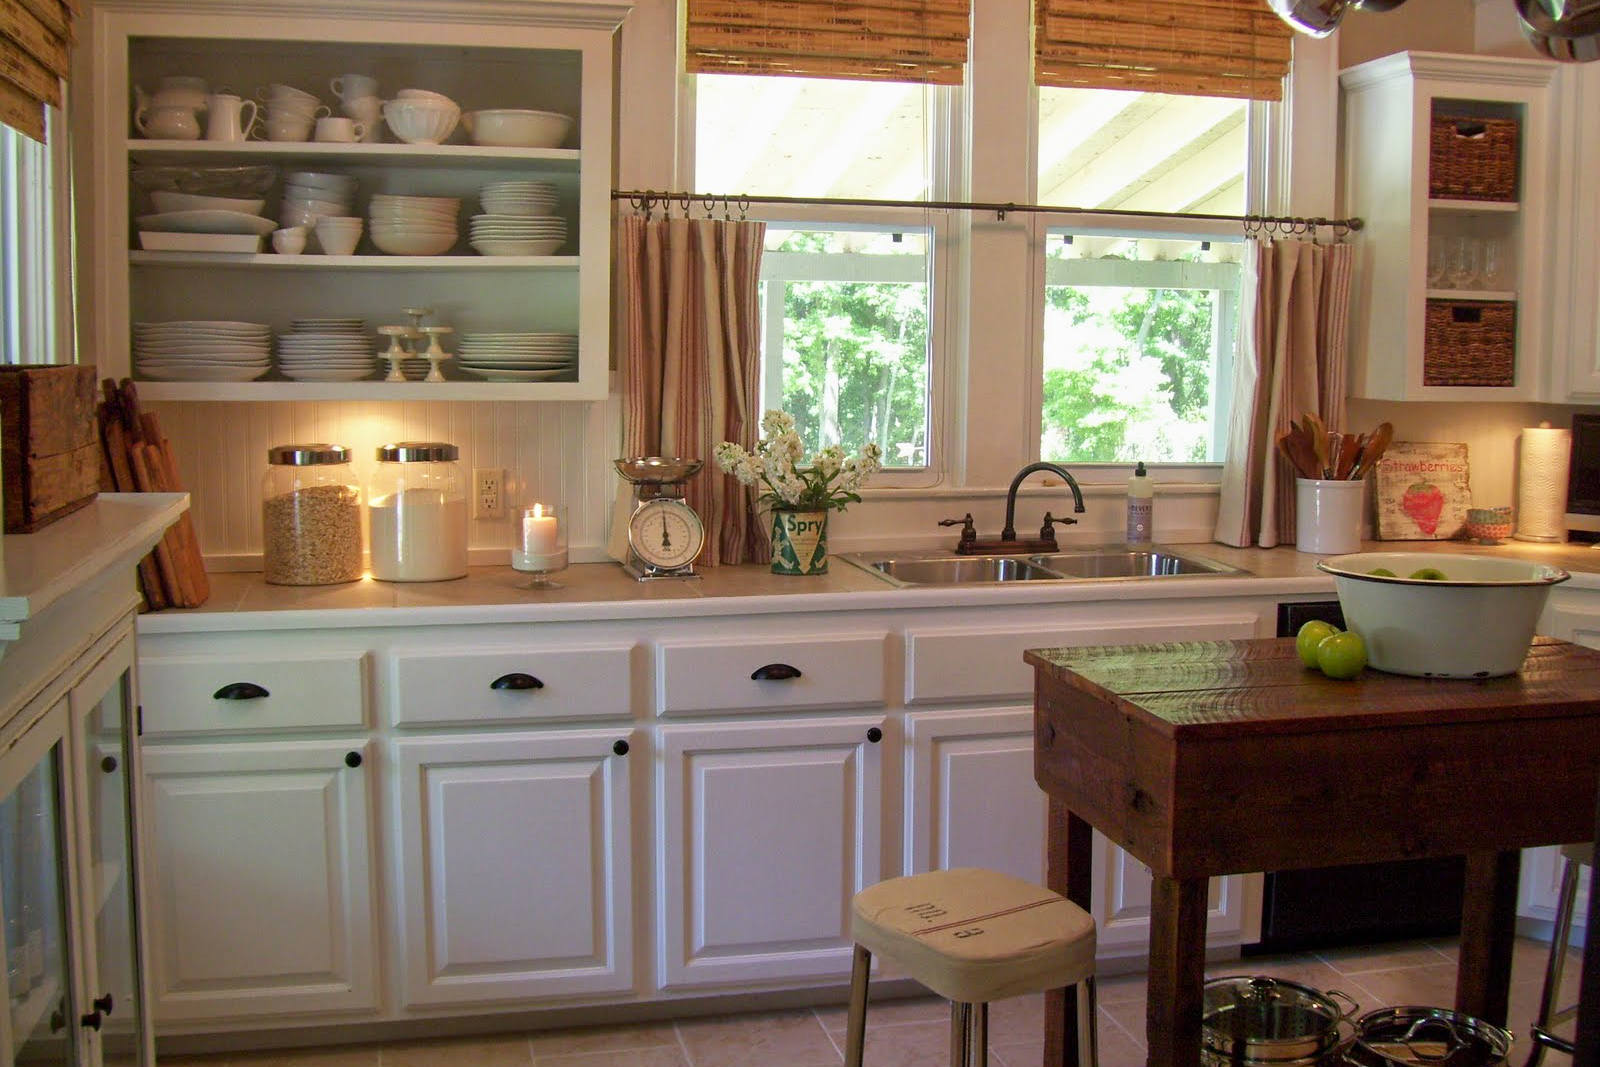 Kitchen Renovation Budget Wpa Wpart Co